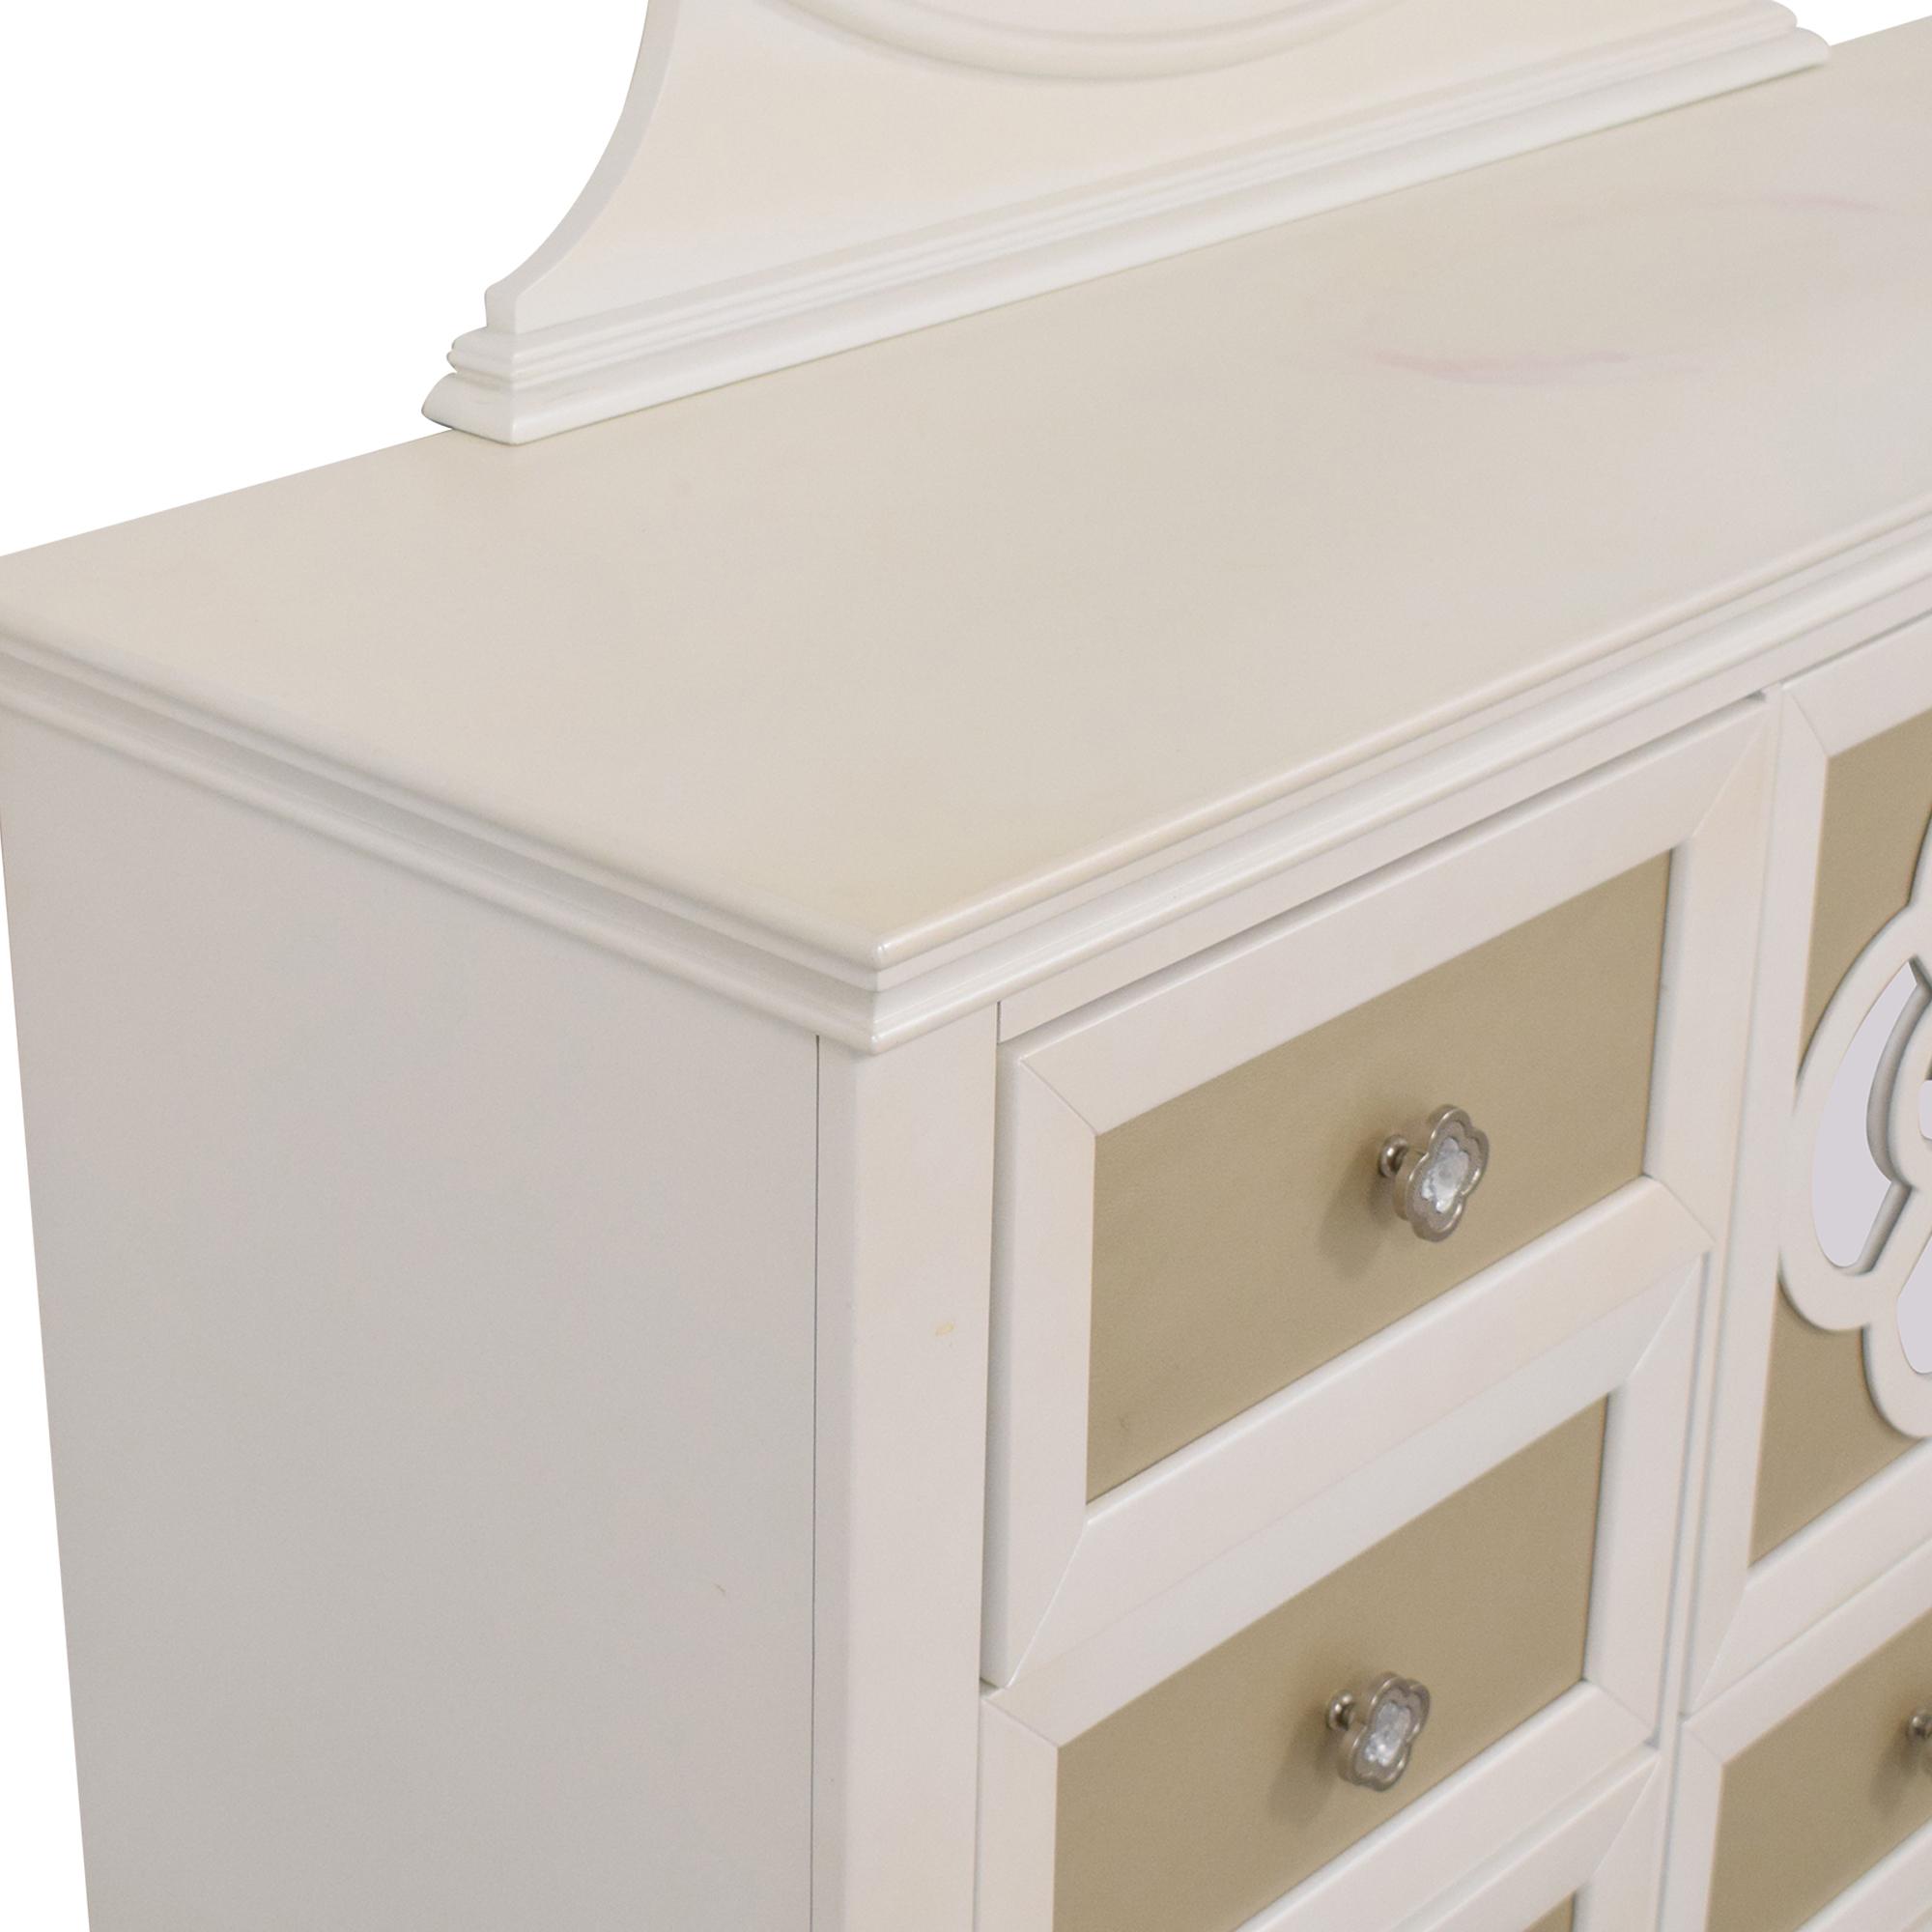 Najarian Furniture Raymour & Flanigan Paris Dresser with Mirror dimensions